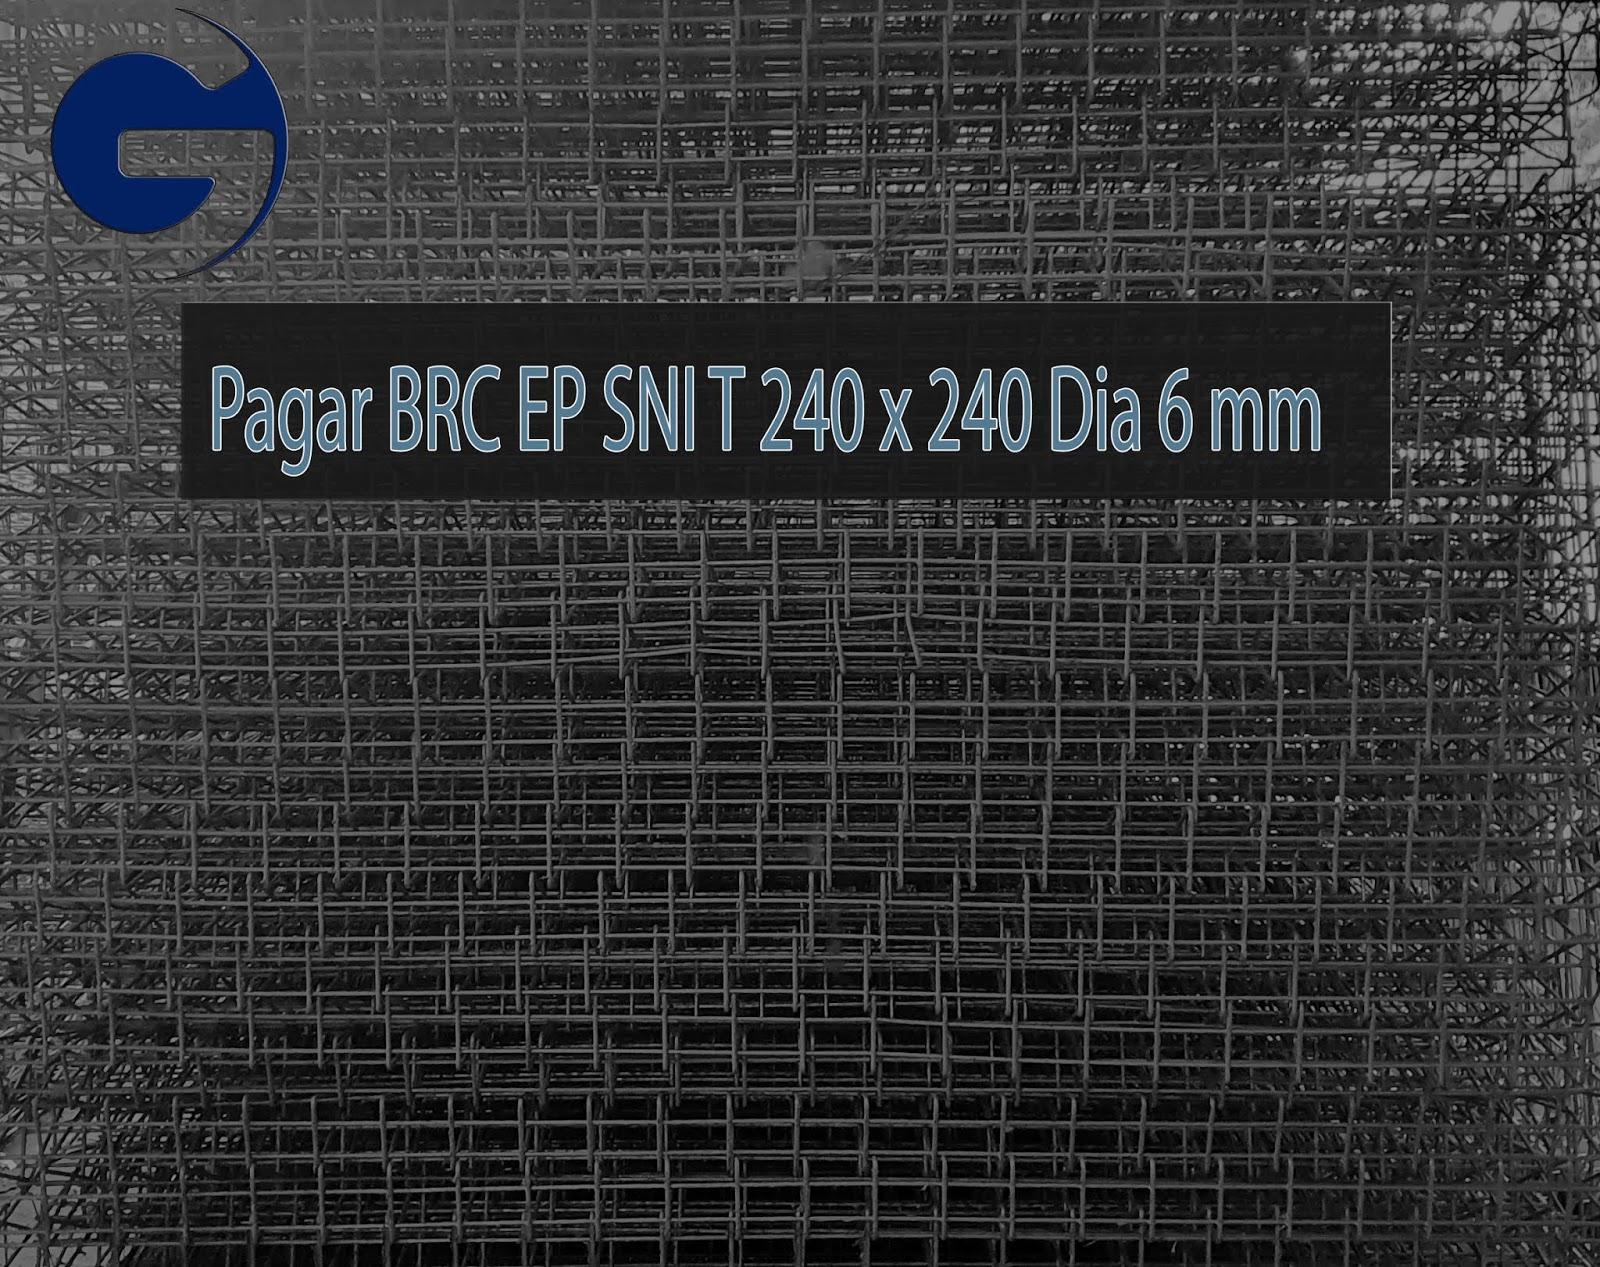 Jual Pagar BRC EP SNI T 240 x 240 Dia 6 mm